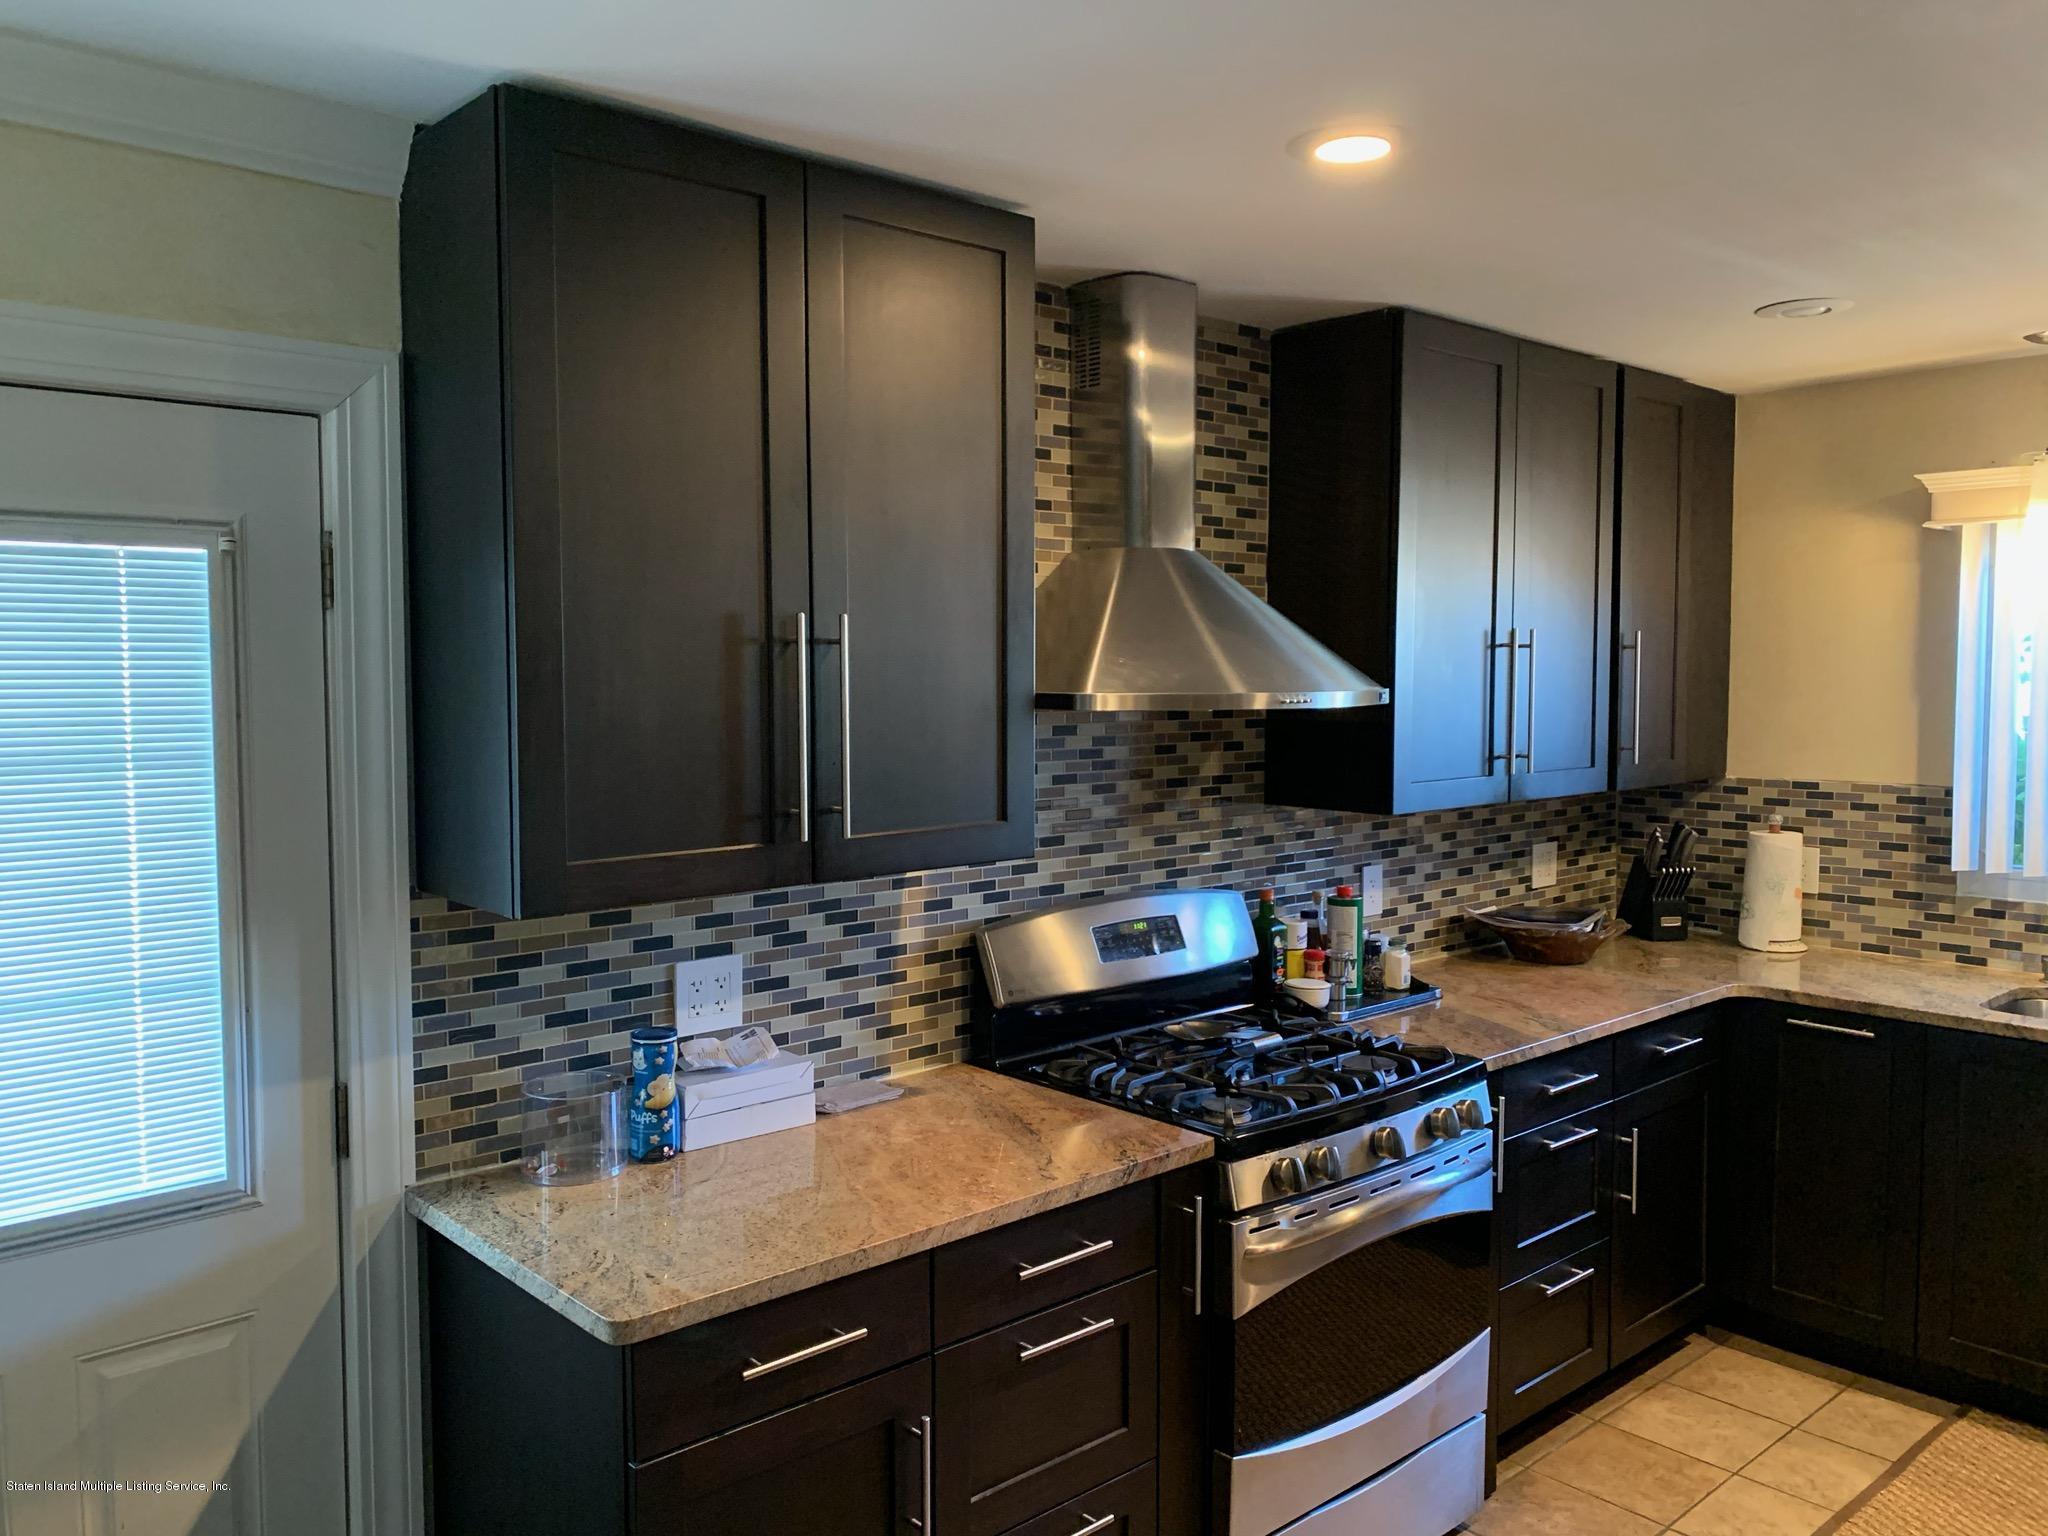 Single Family - Detached 58 Guyon Avenue  Staten Island, NY 10306, MLS-1135873-6